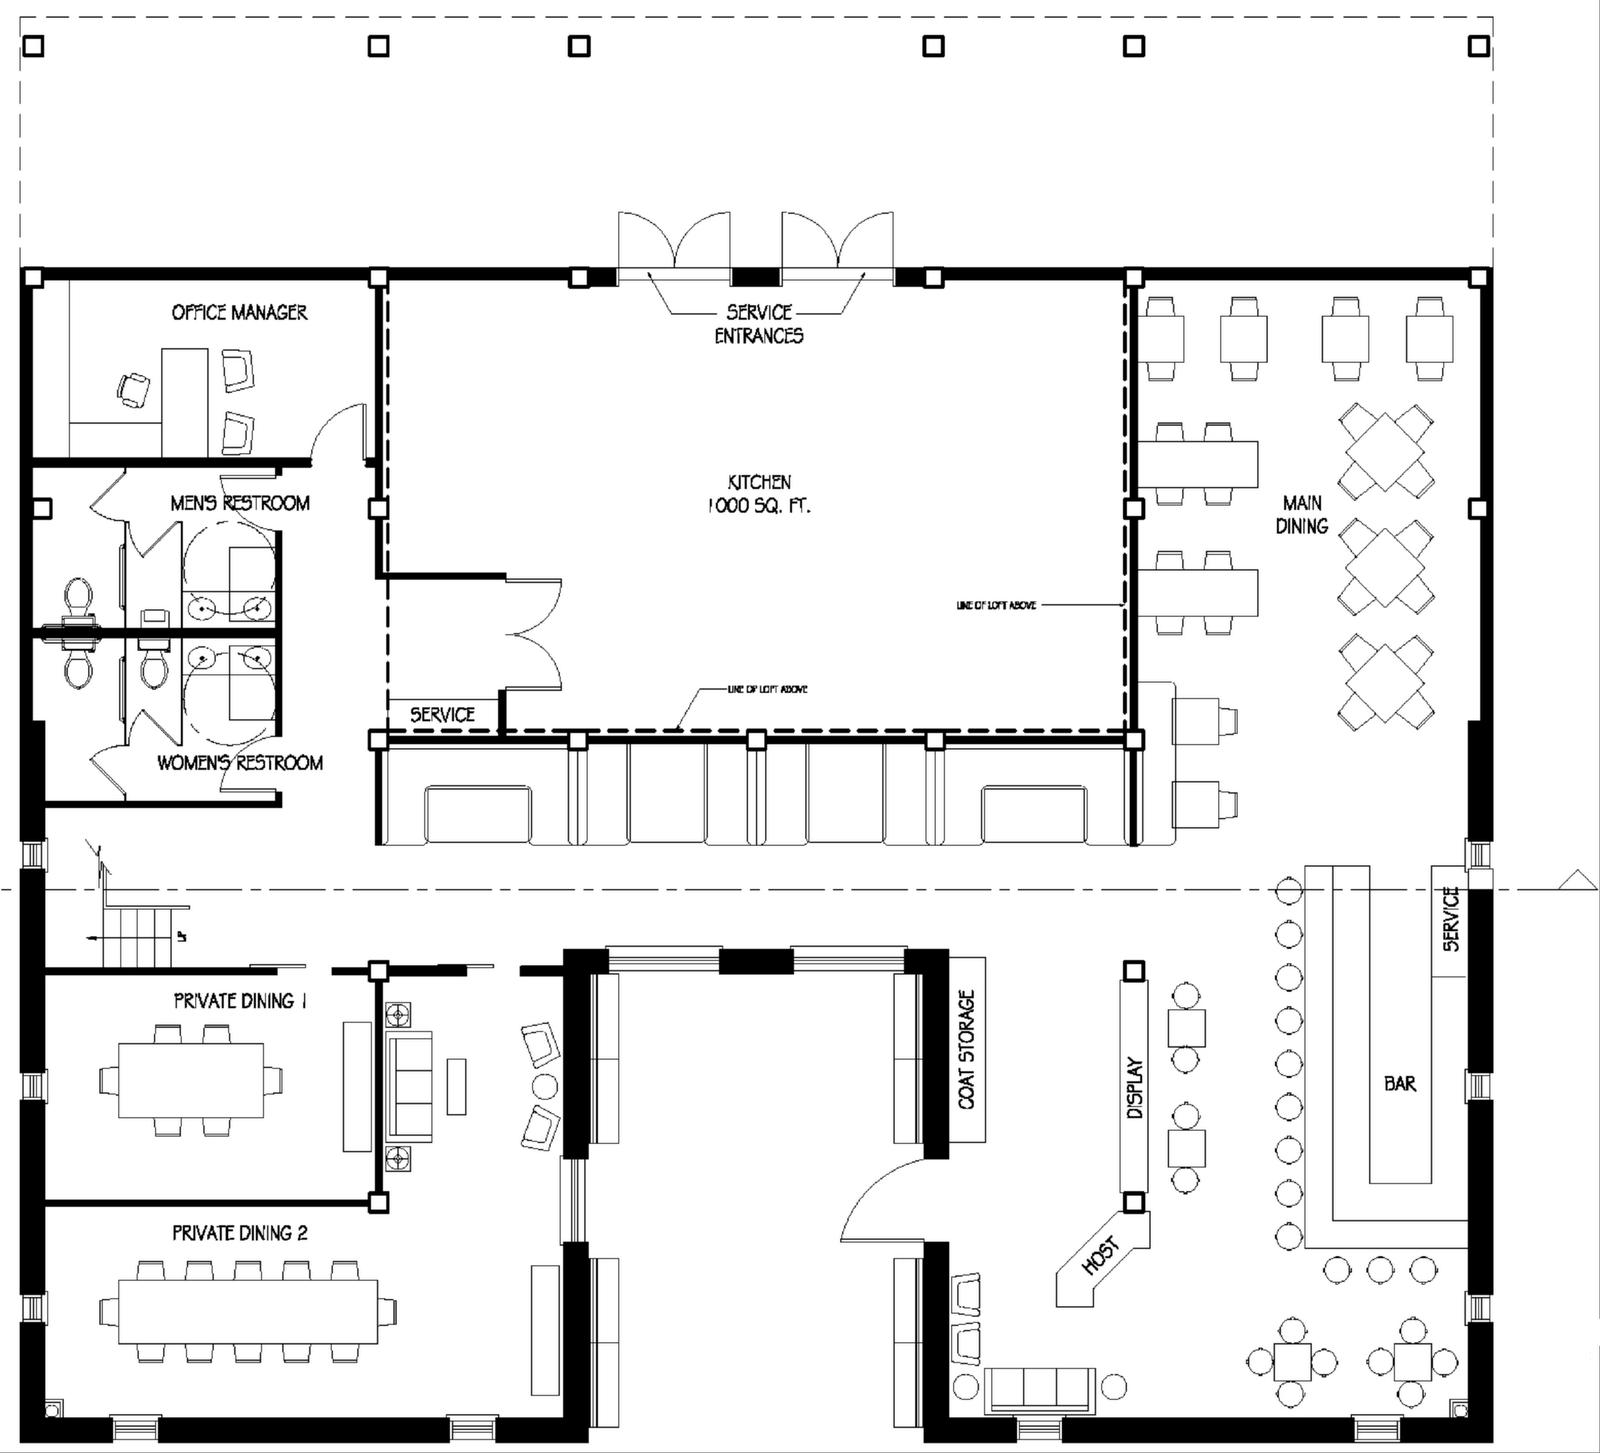 Turquiose Restaurant Restaurant floor plan, Restaurant